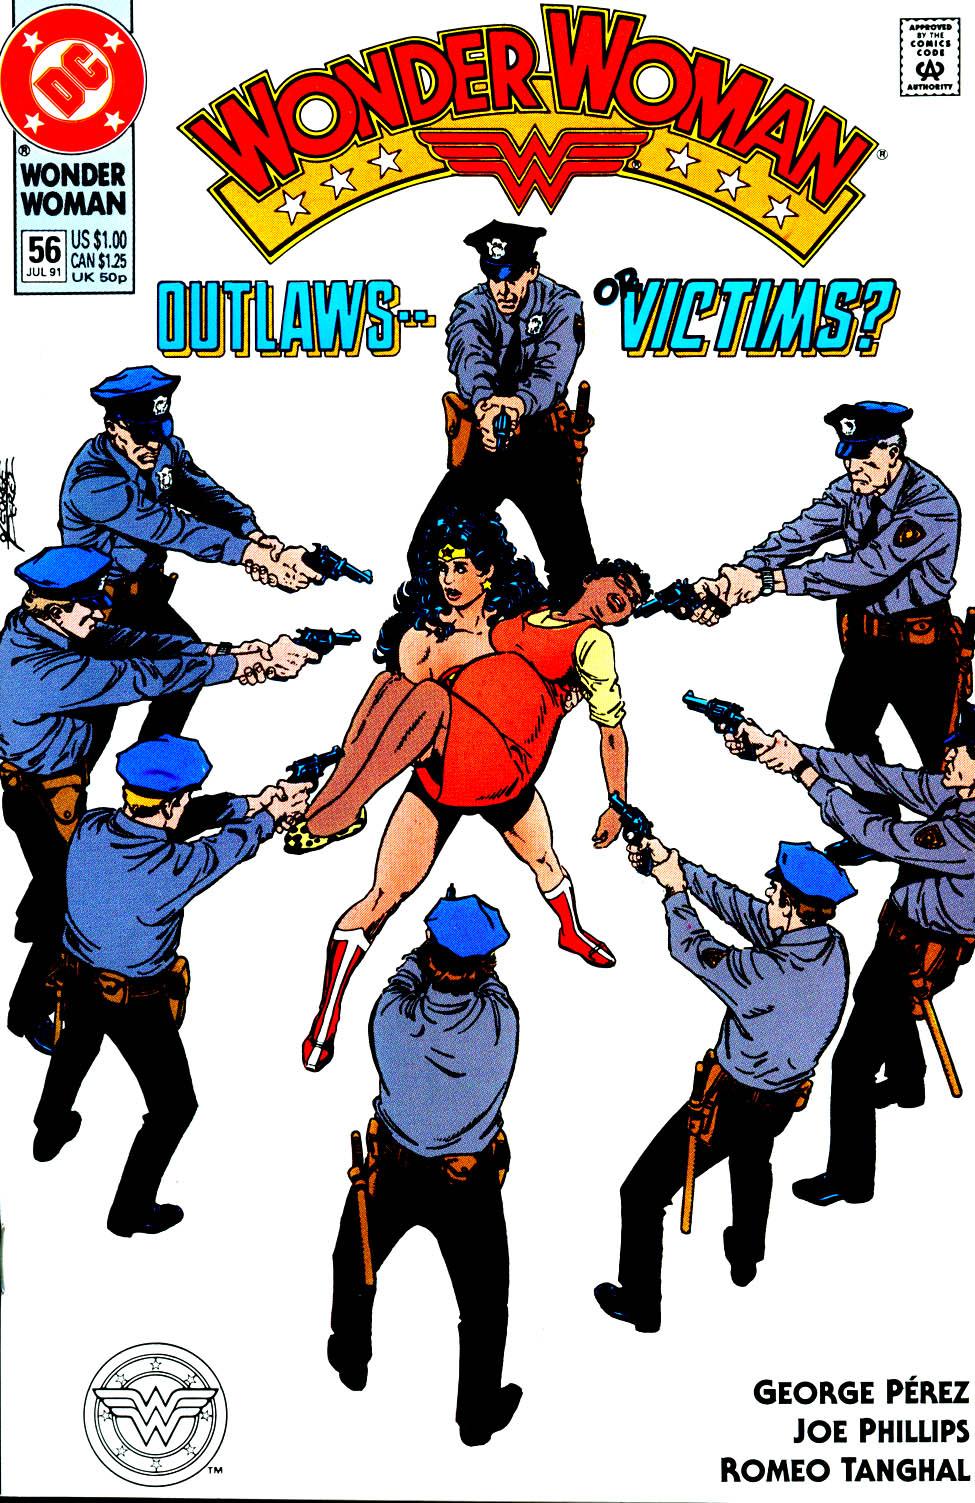 Read online Wonder Woman (1987) comic -  Issue #56 - 2